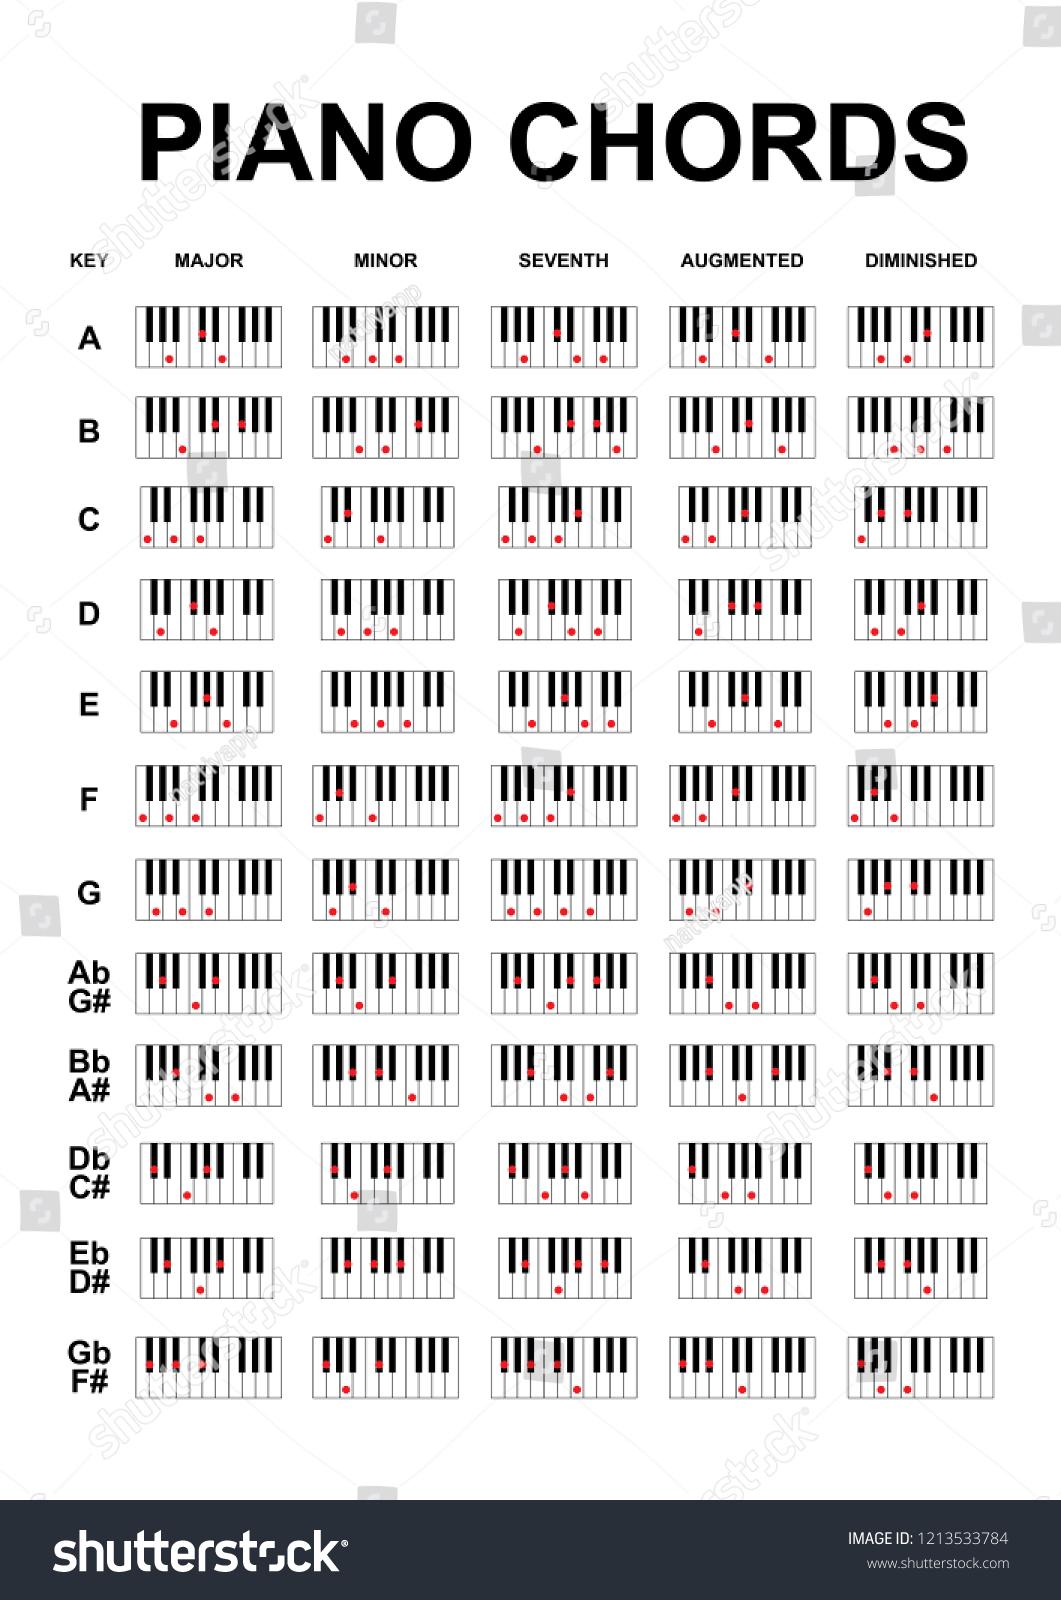 Piano Chords Piano Key Notes Chart Stock Vector Royalty Free ...